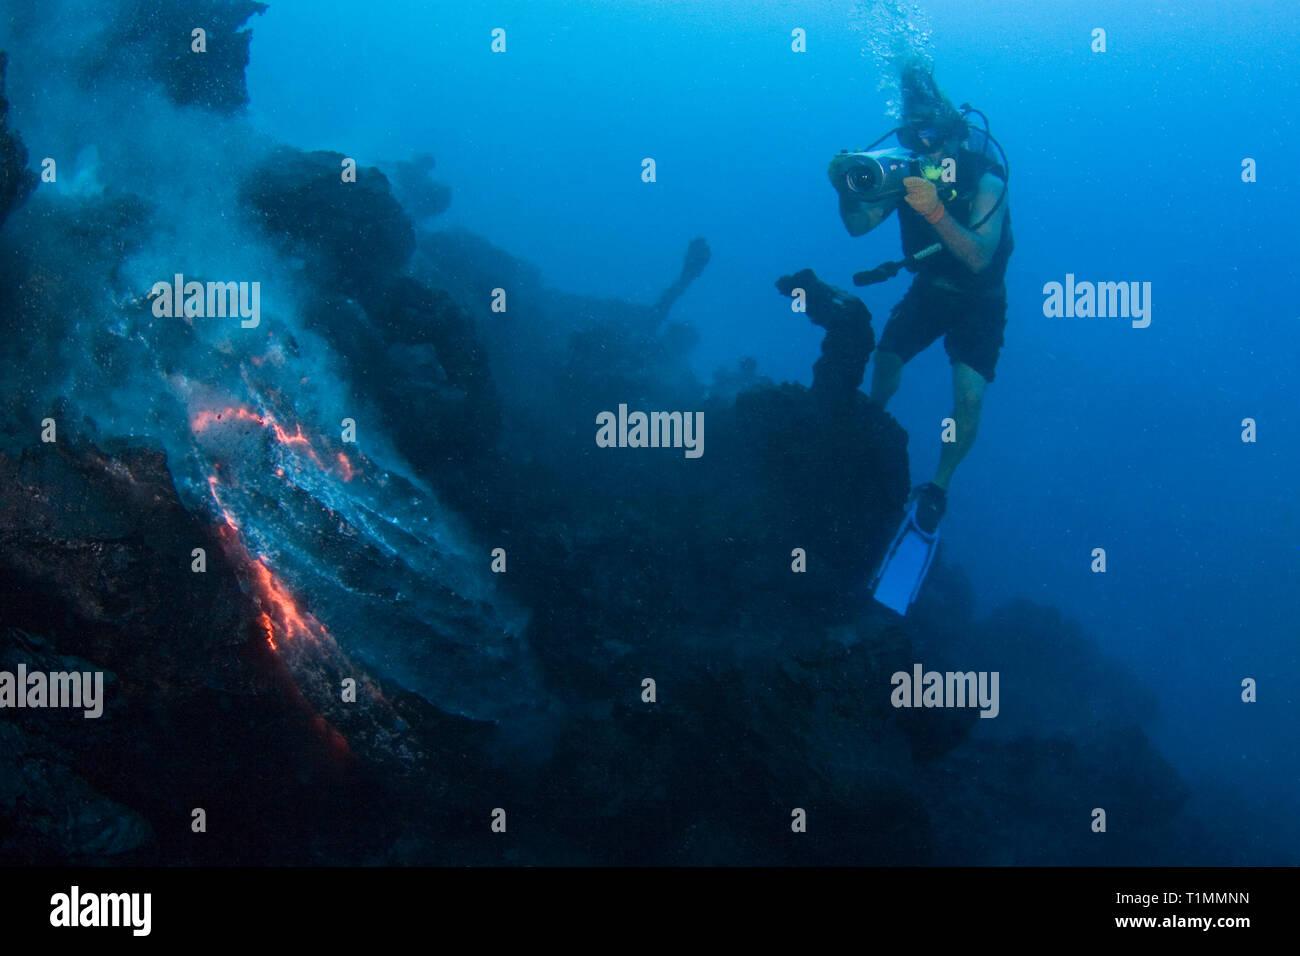 videographer Shane Turpin films pillow lava at underwater eruption of Kilauea Volcano Hawaii Island ( the Big Island ) Hawaii U.S.A. ( Pacific Ocean ) Stock Photo